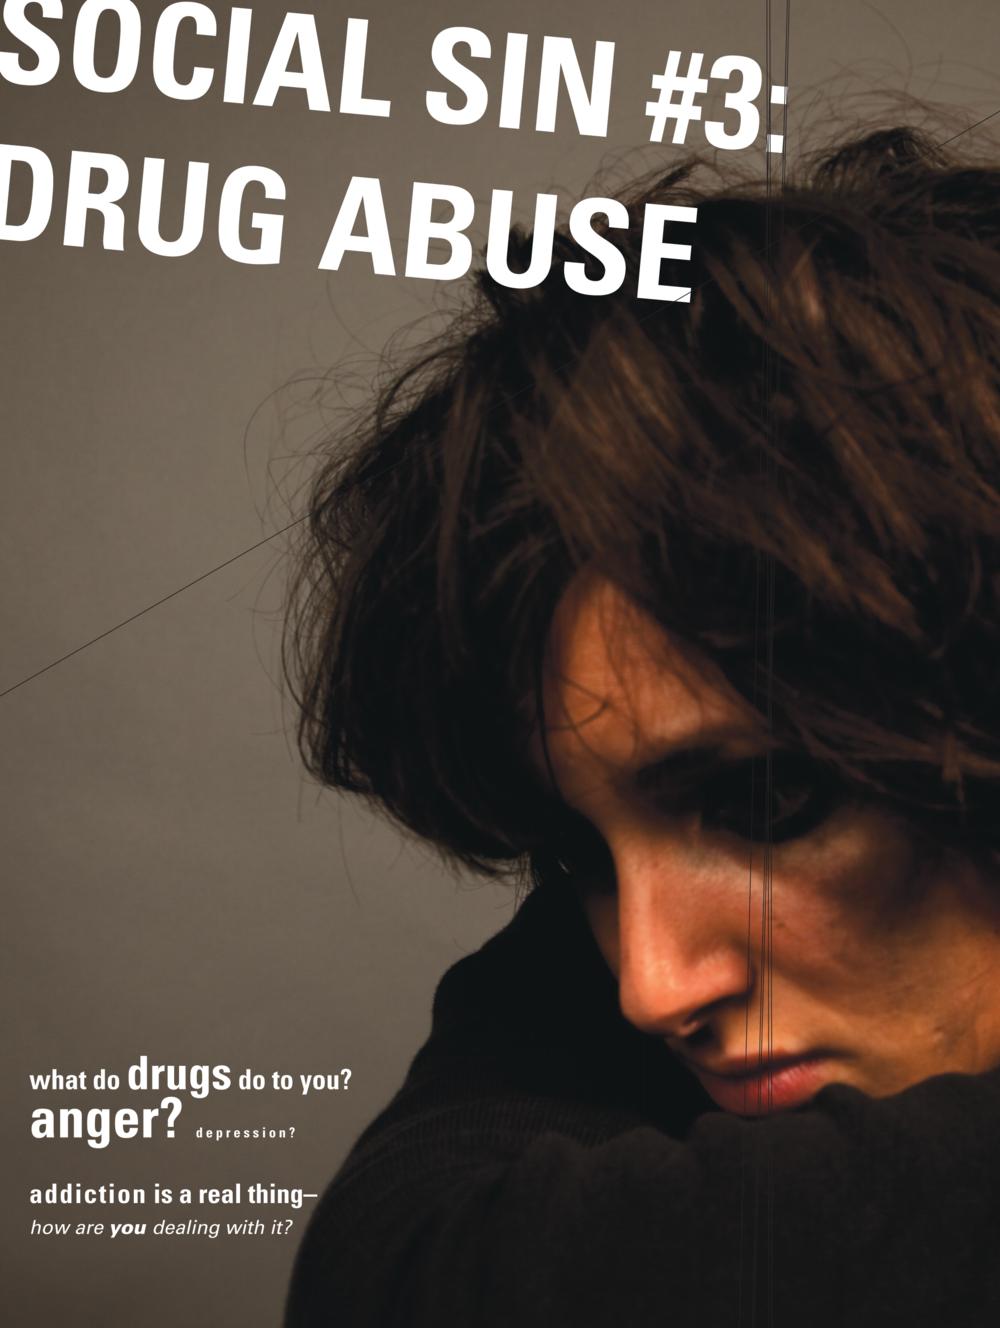 Social Sin #3 Drug Abuse